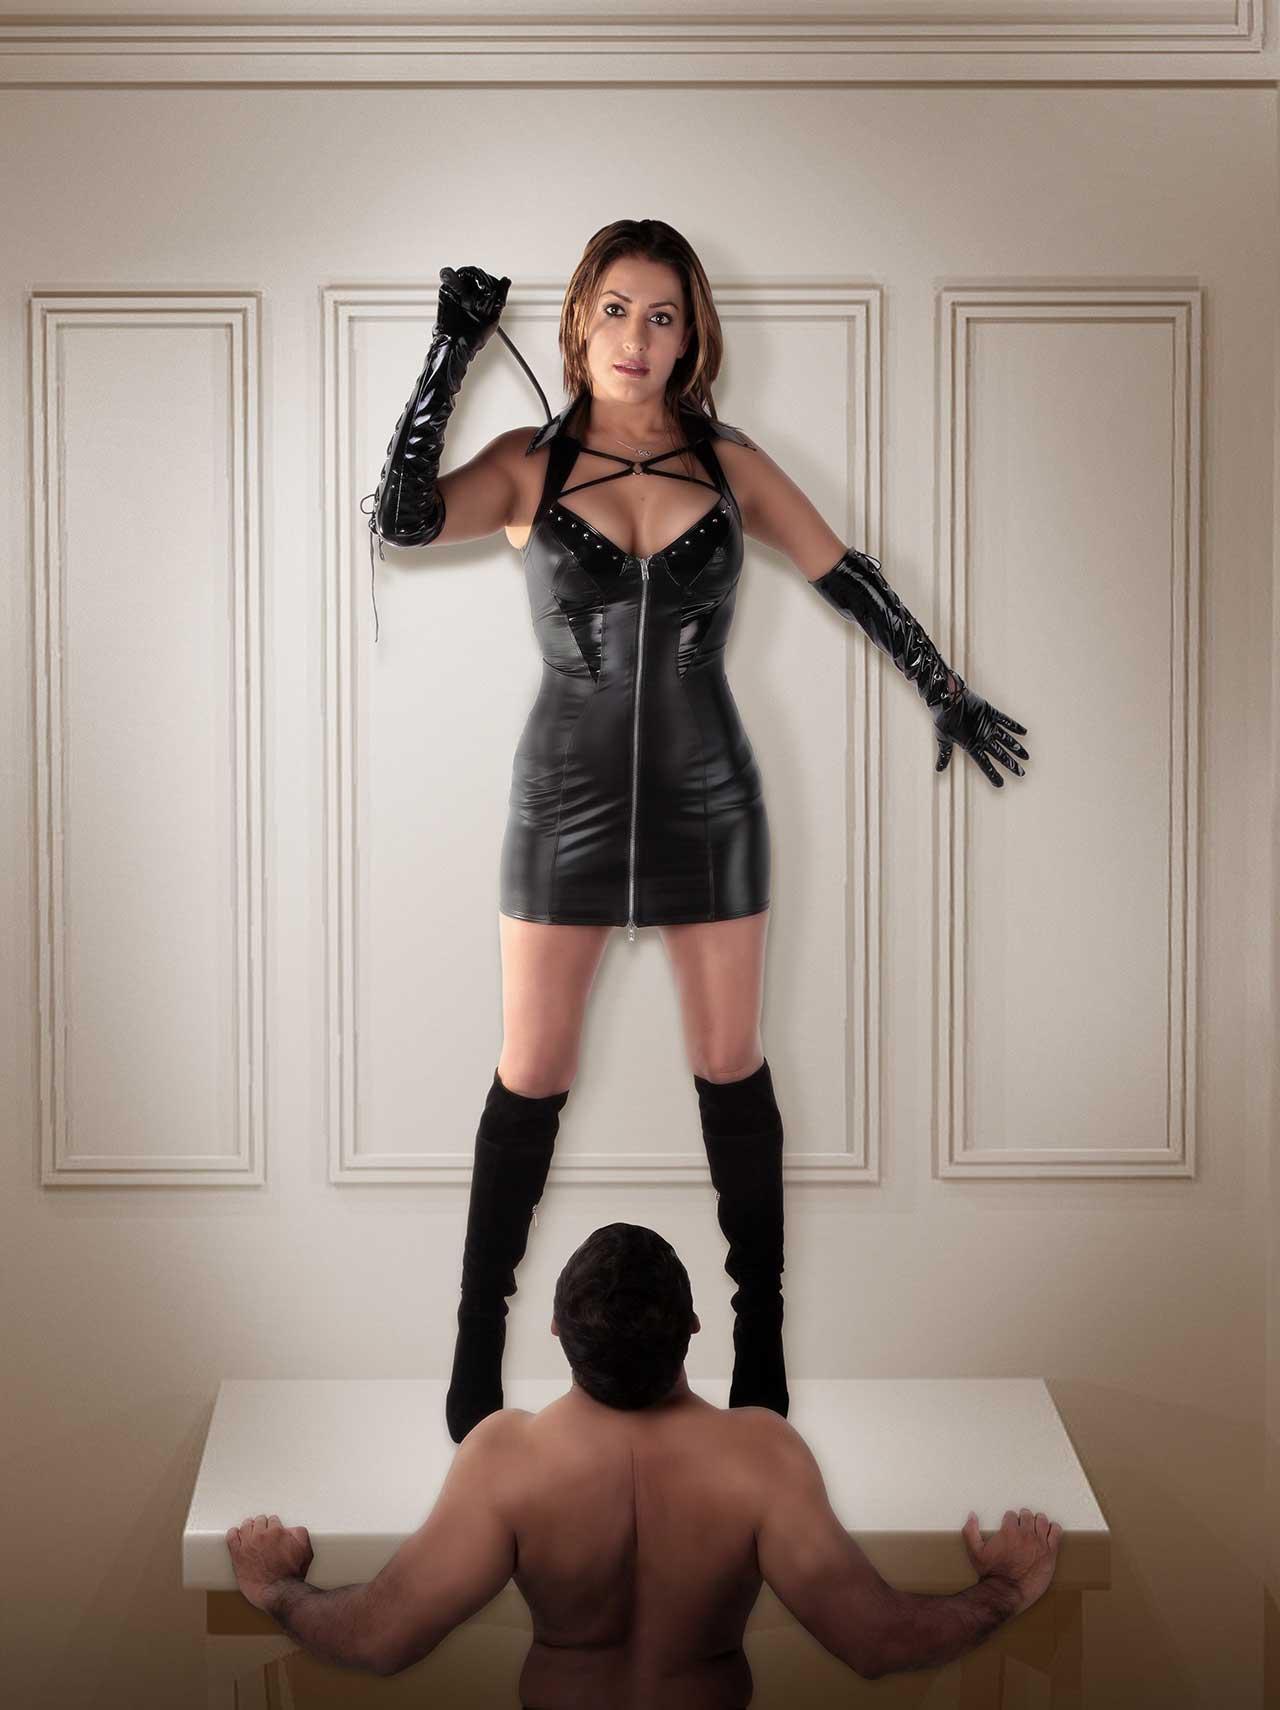 Fetishtransexual dominatrix